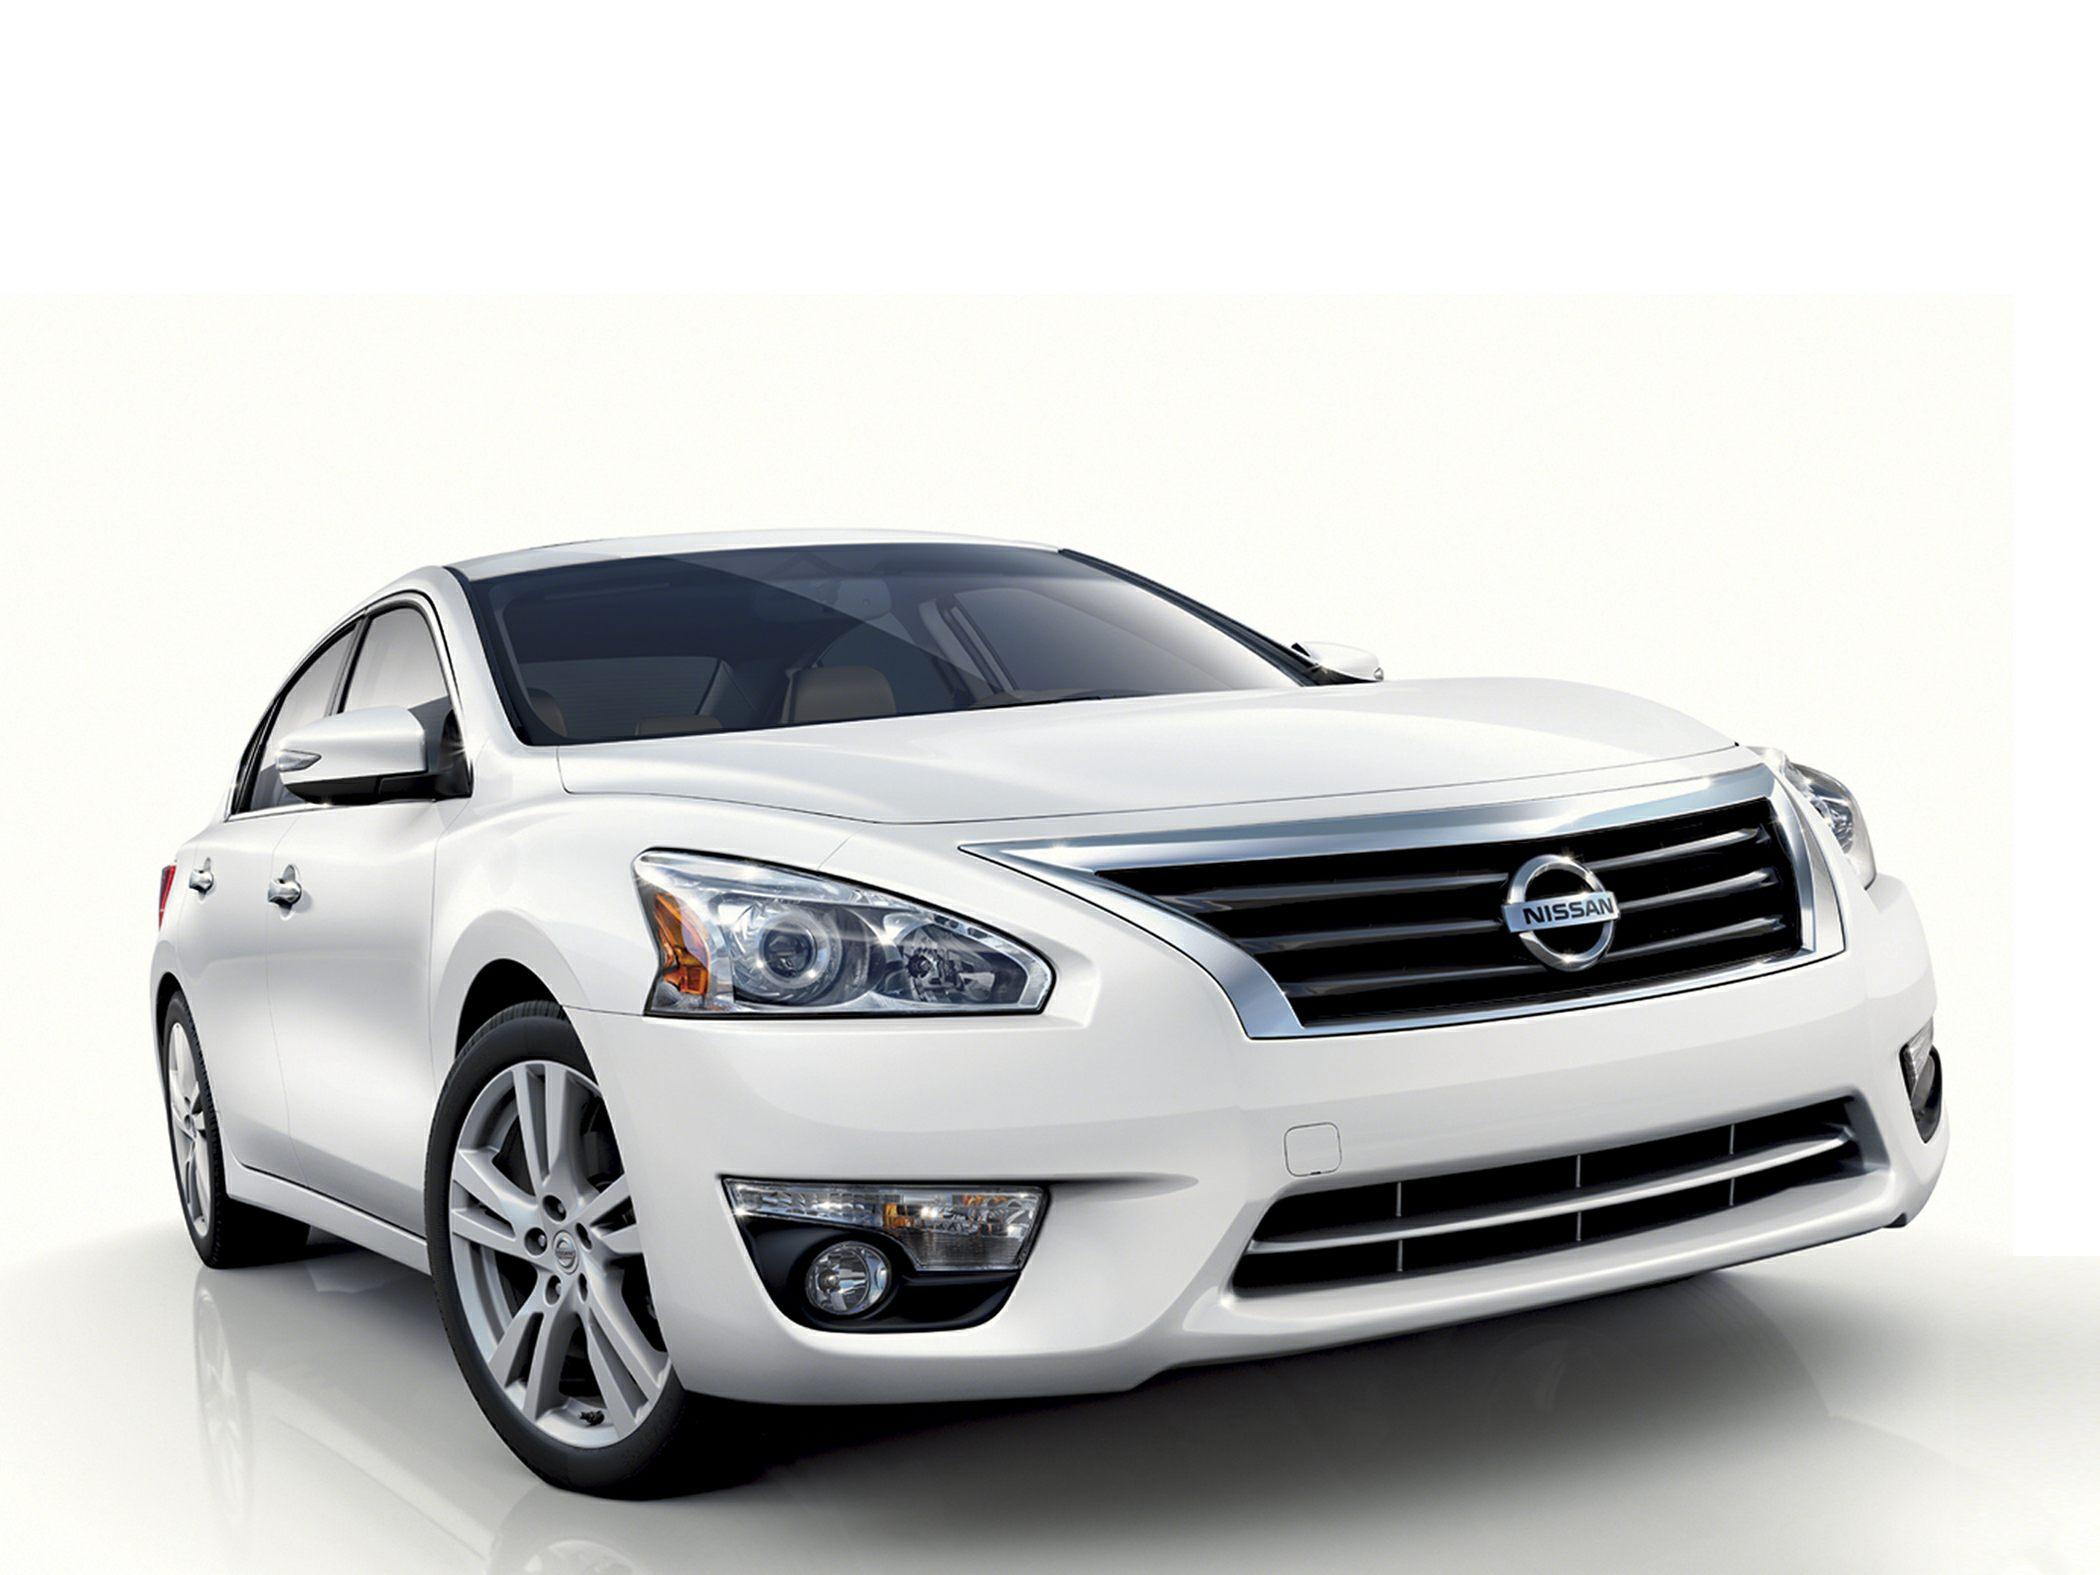 2015 Nissan Altima Glam